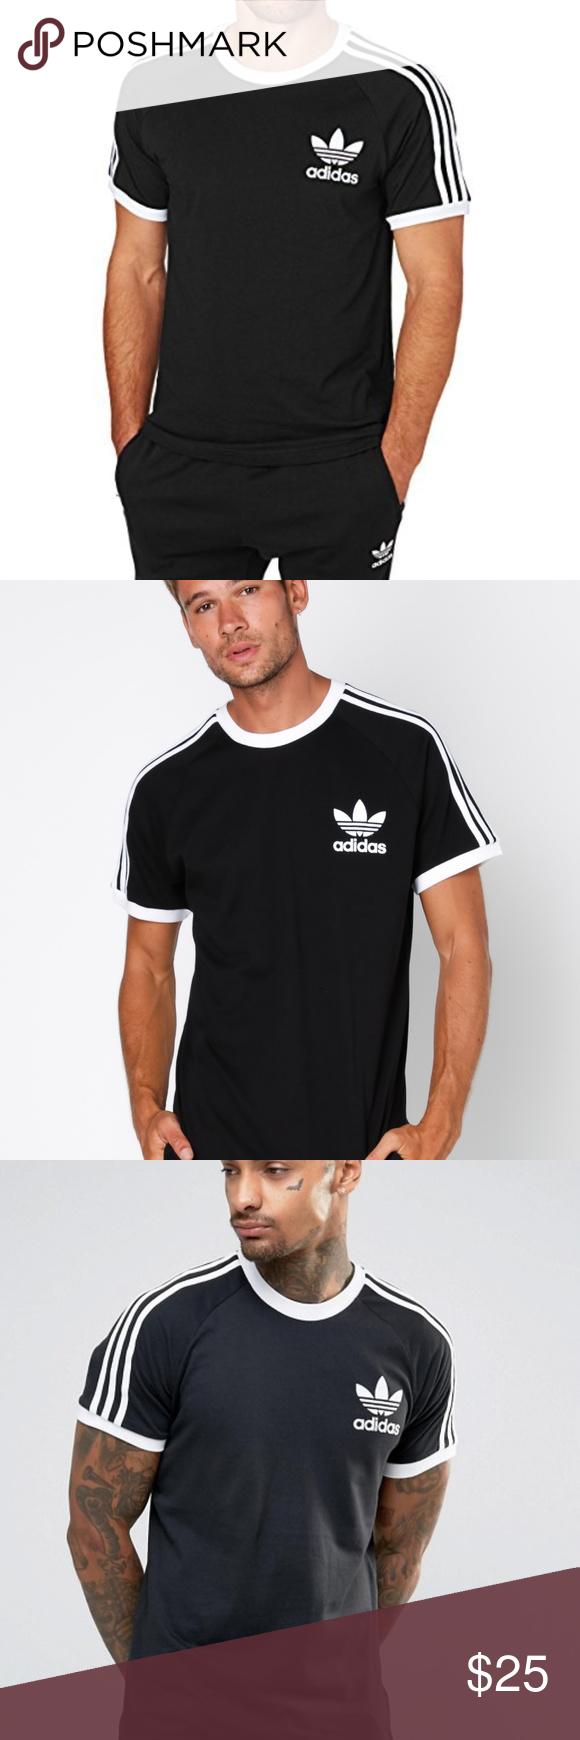 1baea6c0 Adidas 3 Stripes Black California Tee Shirt adidas Originals 3 Stripes  Men's Black White California Tee